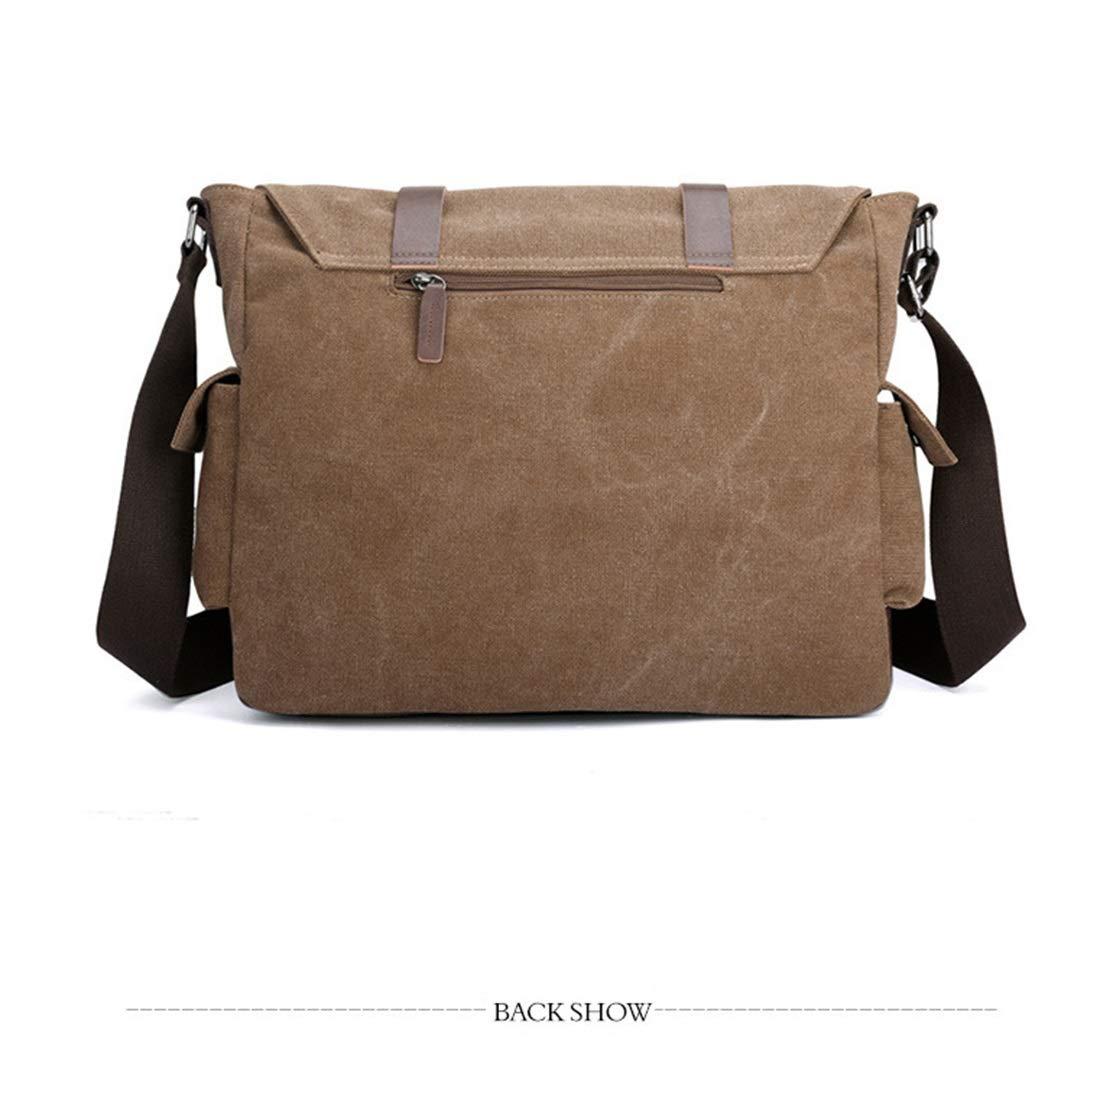 Male Postman Bag Single Shoulder European and American Ancient Canvas Color : Brown Multi-Purpose Function Canvas Bag Male Bag KRPENRIO Canvas Traveling Bag